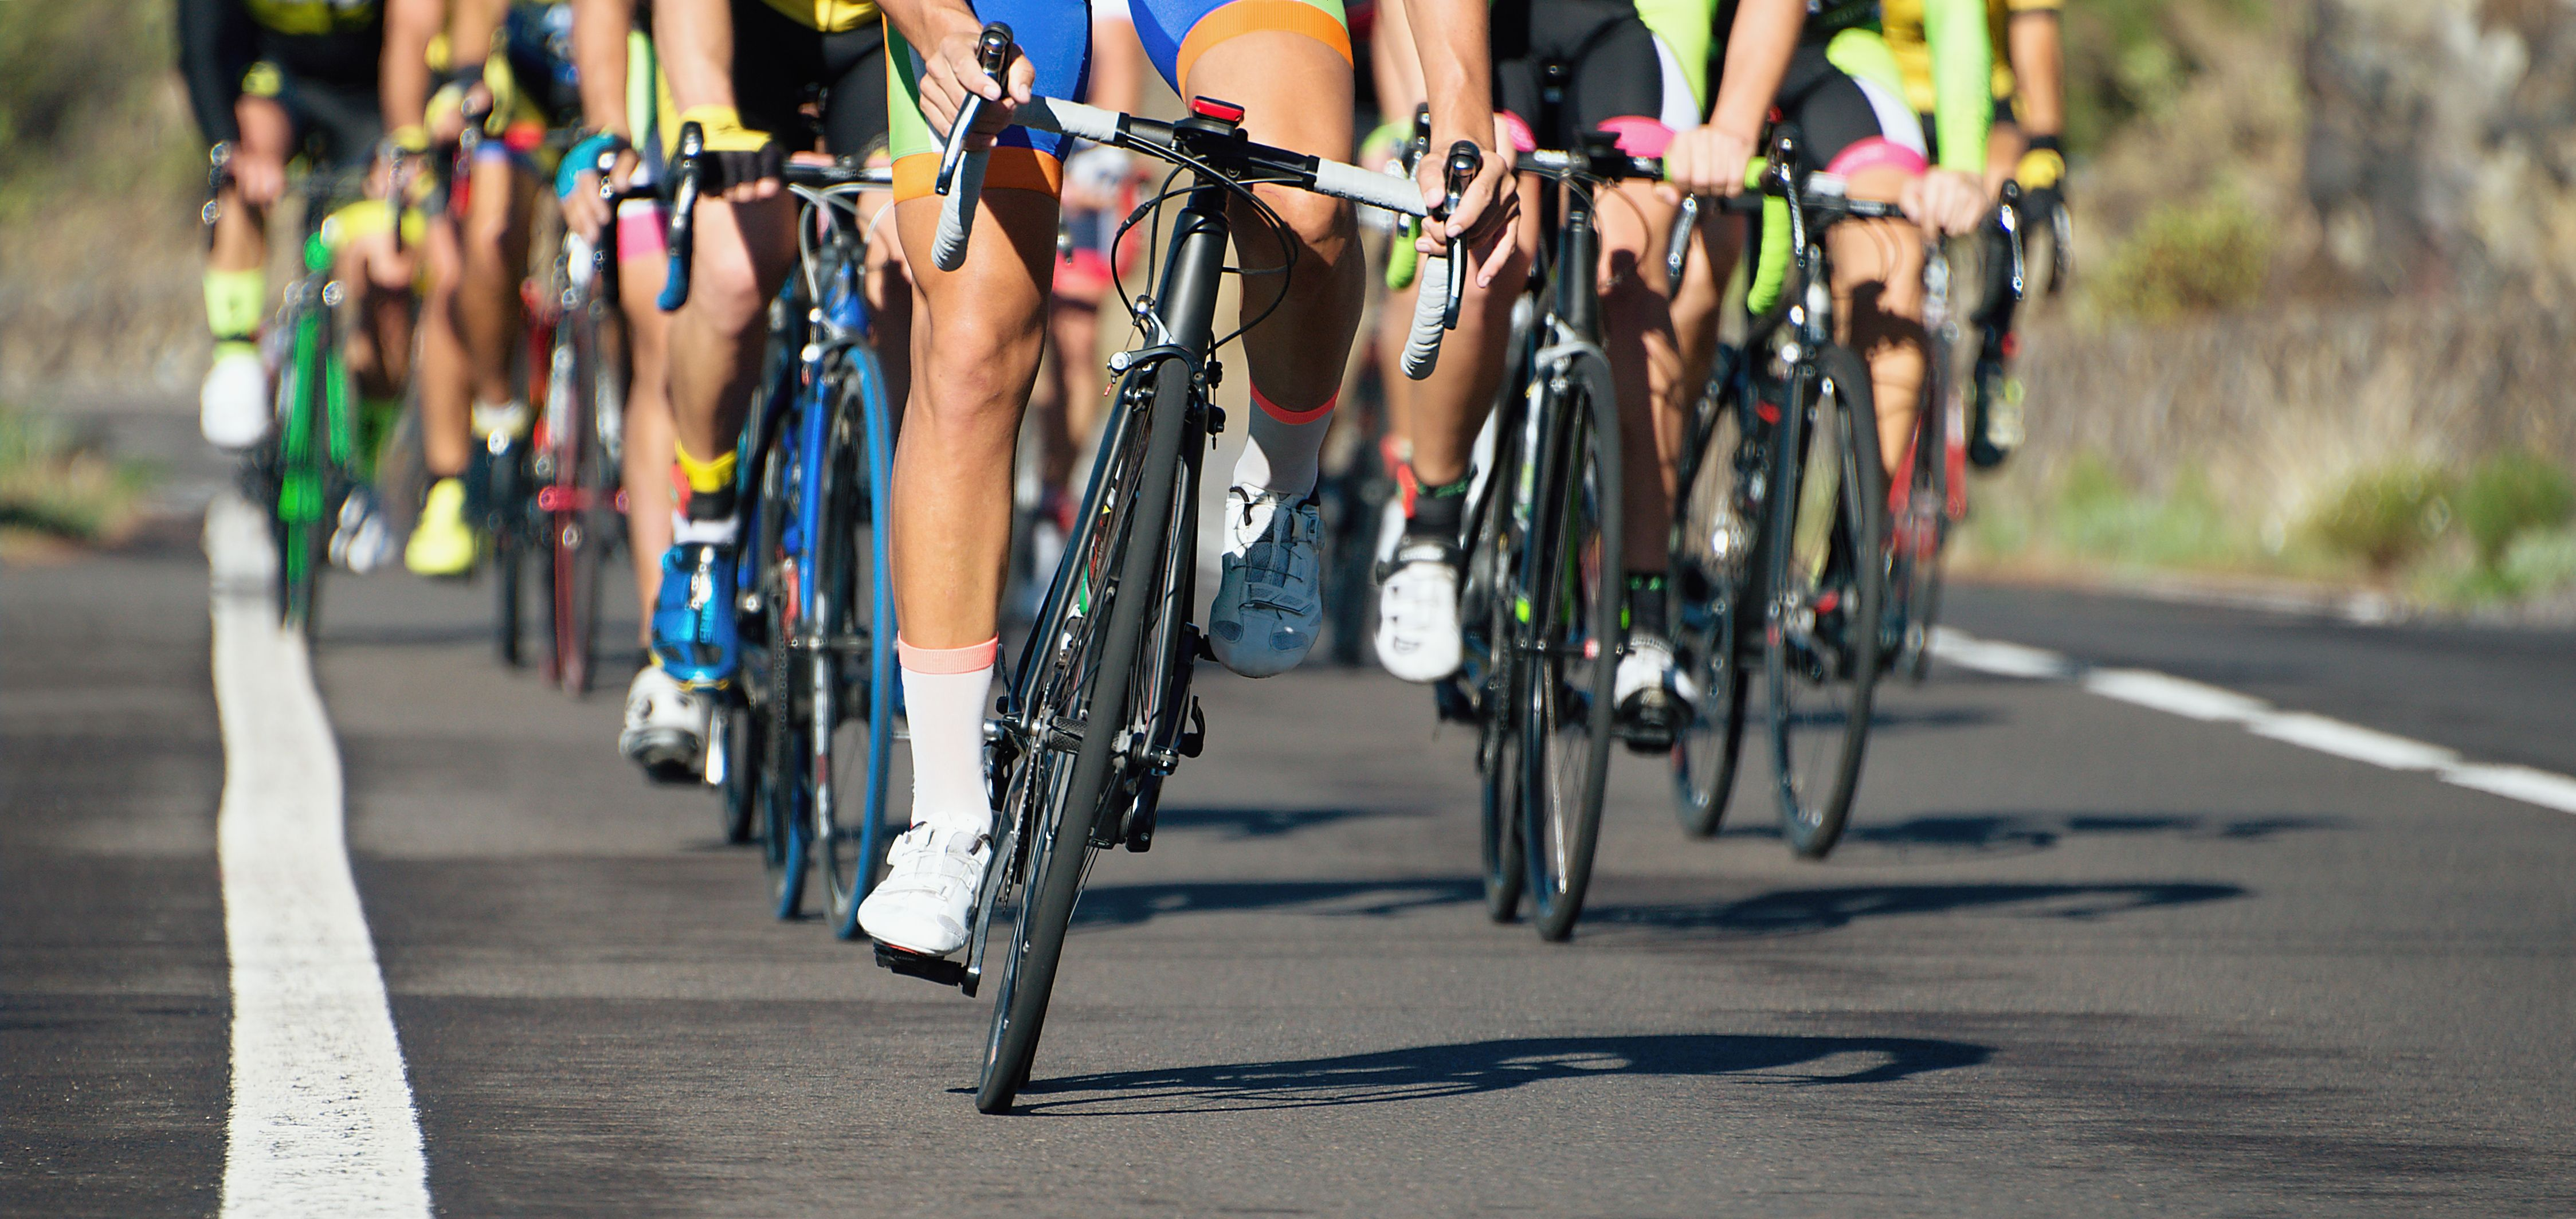 How To Build Stamina Riding A Bike Cycling Training Plan